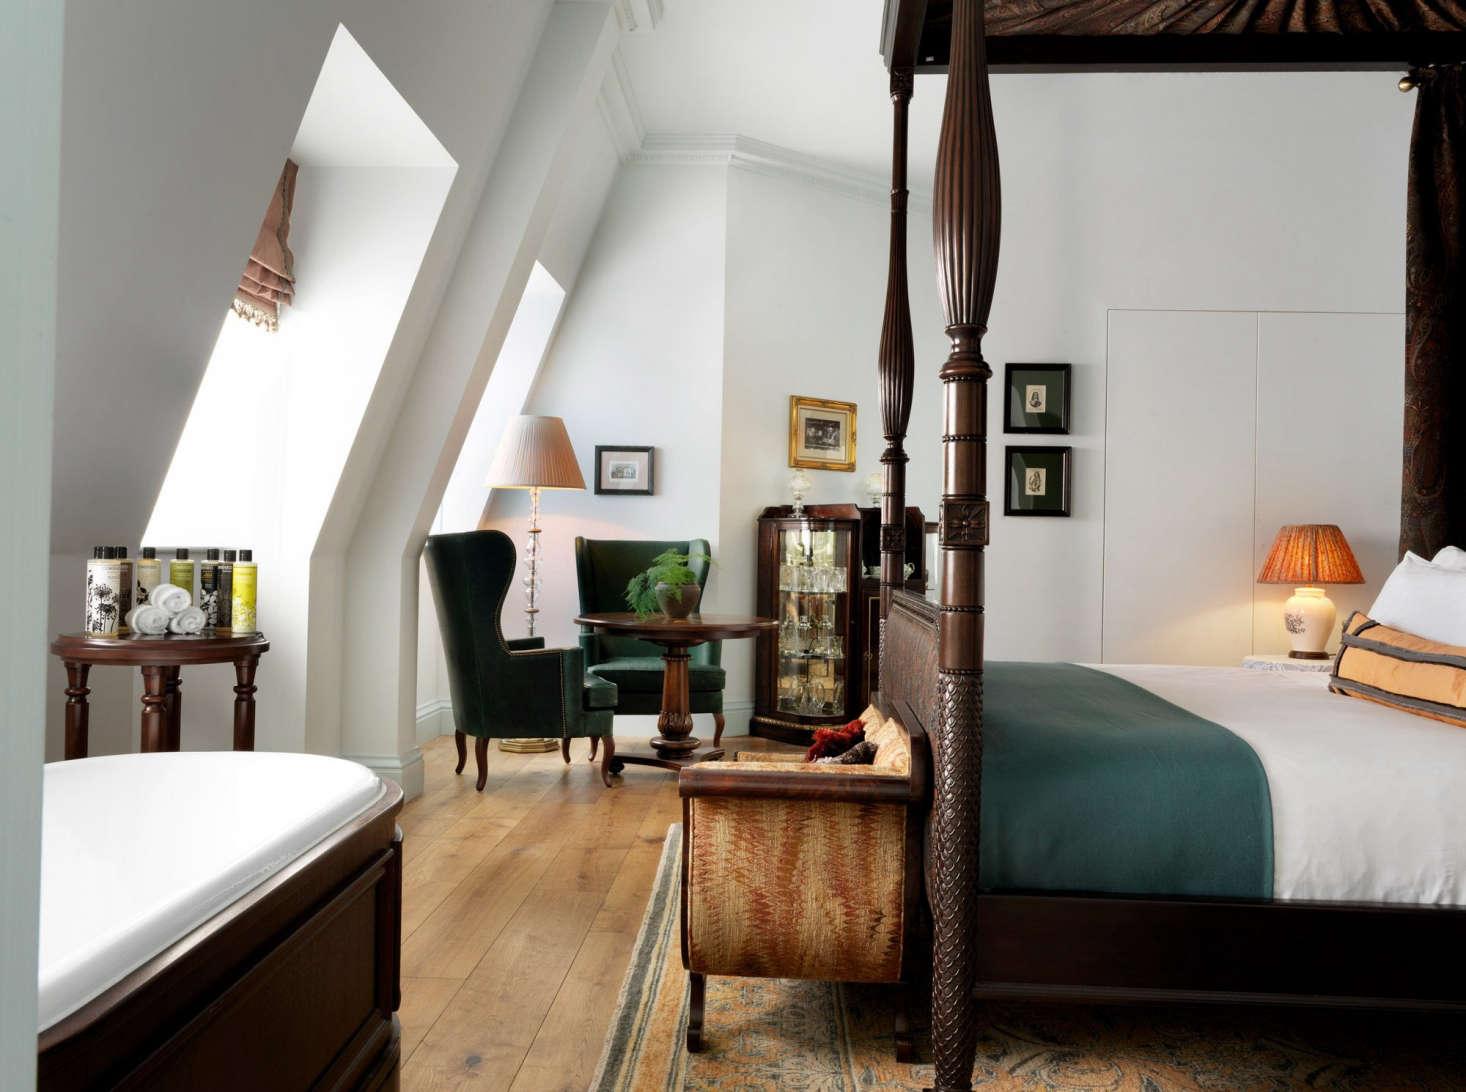 The Ned Hotel A Stately London Landmark Transformed